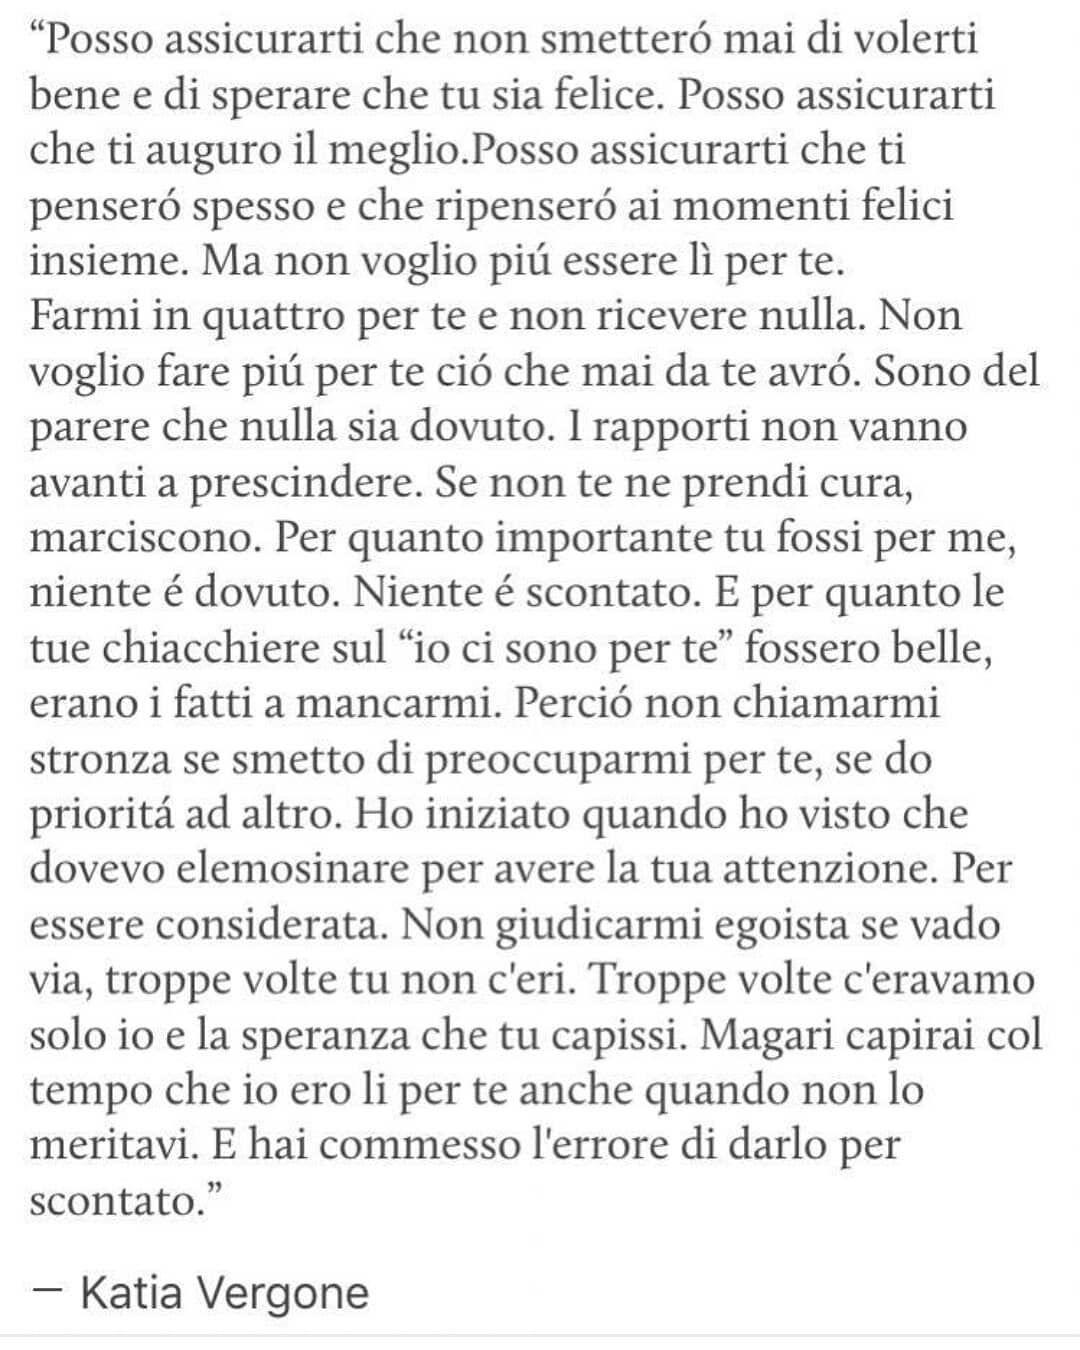 #frasi#frasitumbrl#tumbrl#frasiditumbrl#aforismi#pensieri#amicizia#amore#frasiitaliane#citazioni#ragazzatumbrl_25